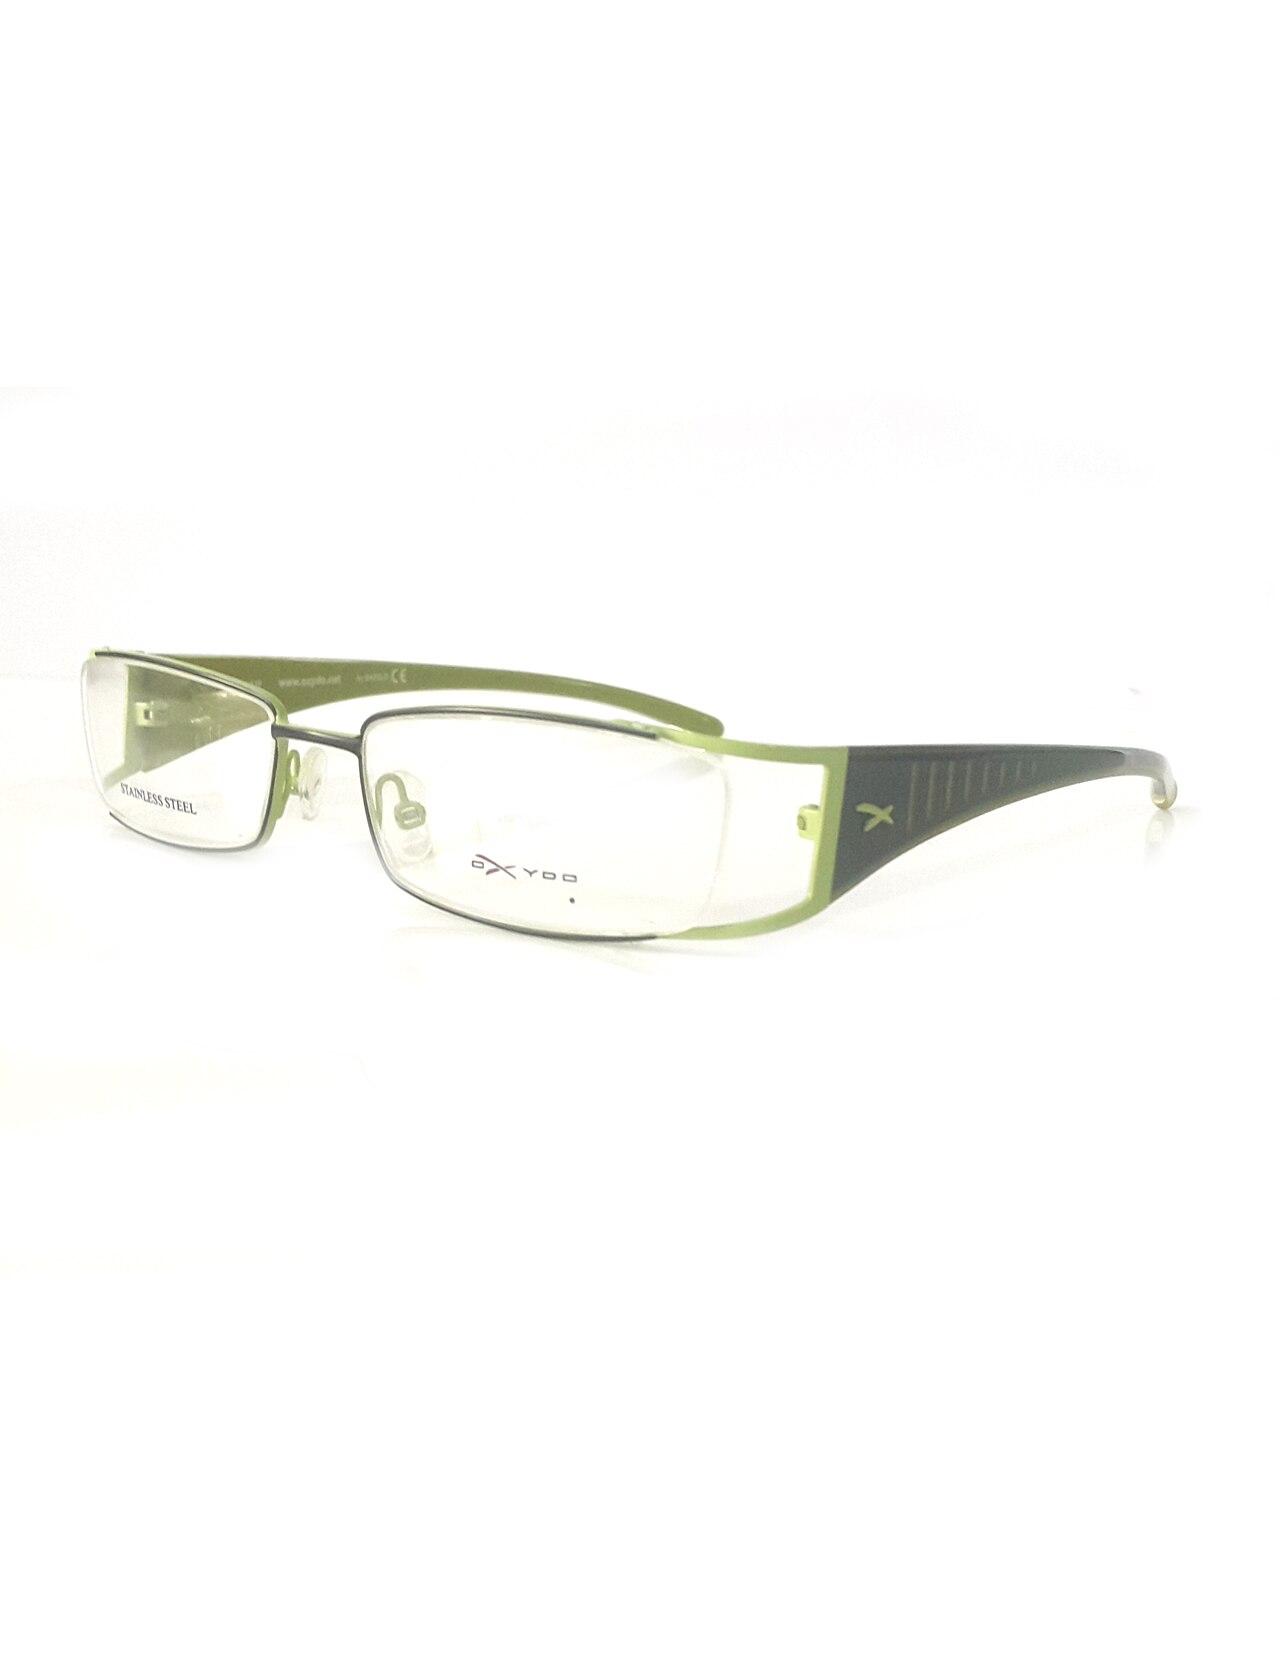 Markamilla Women Reading Glasses Frame Demo Glasses Eyewear Transparent High Quality WomenOxydo OX 308 UJT 53 17